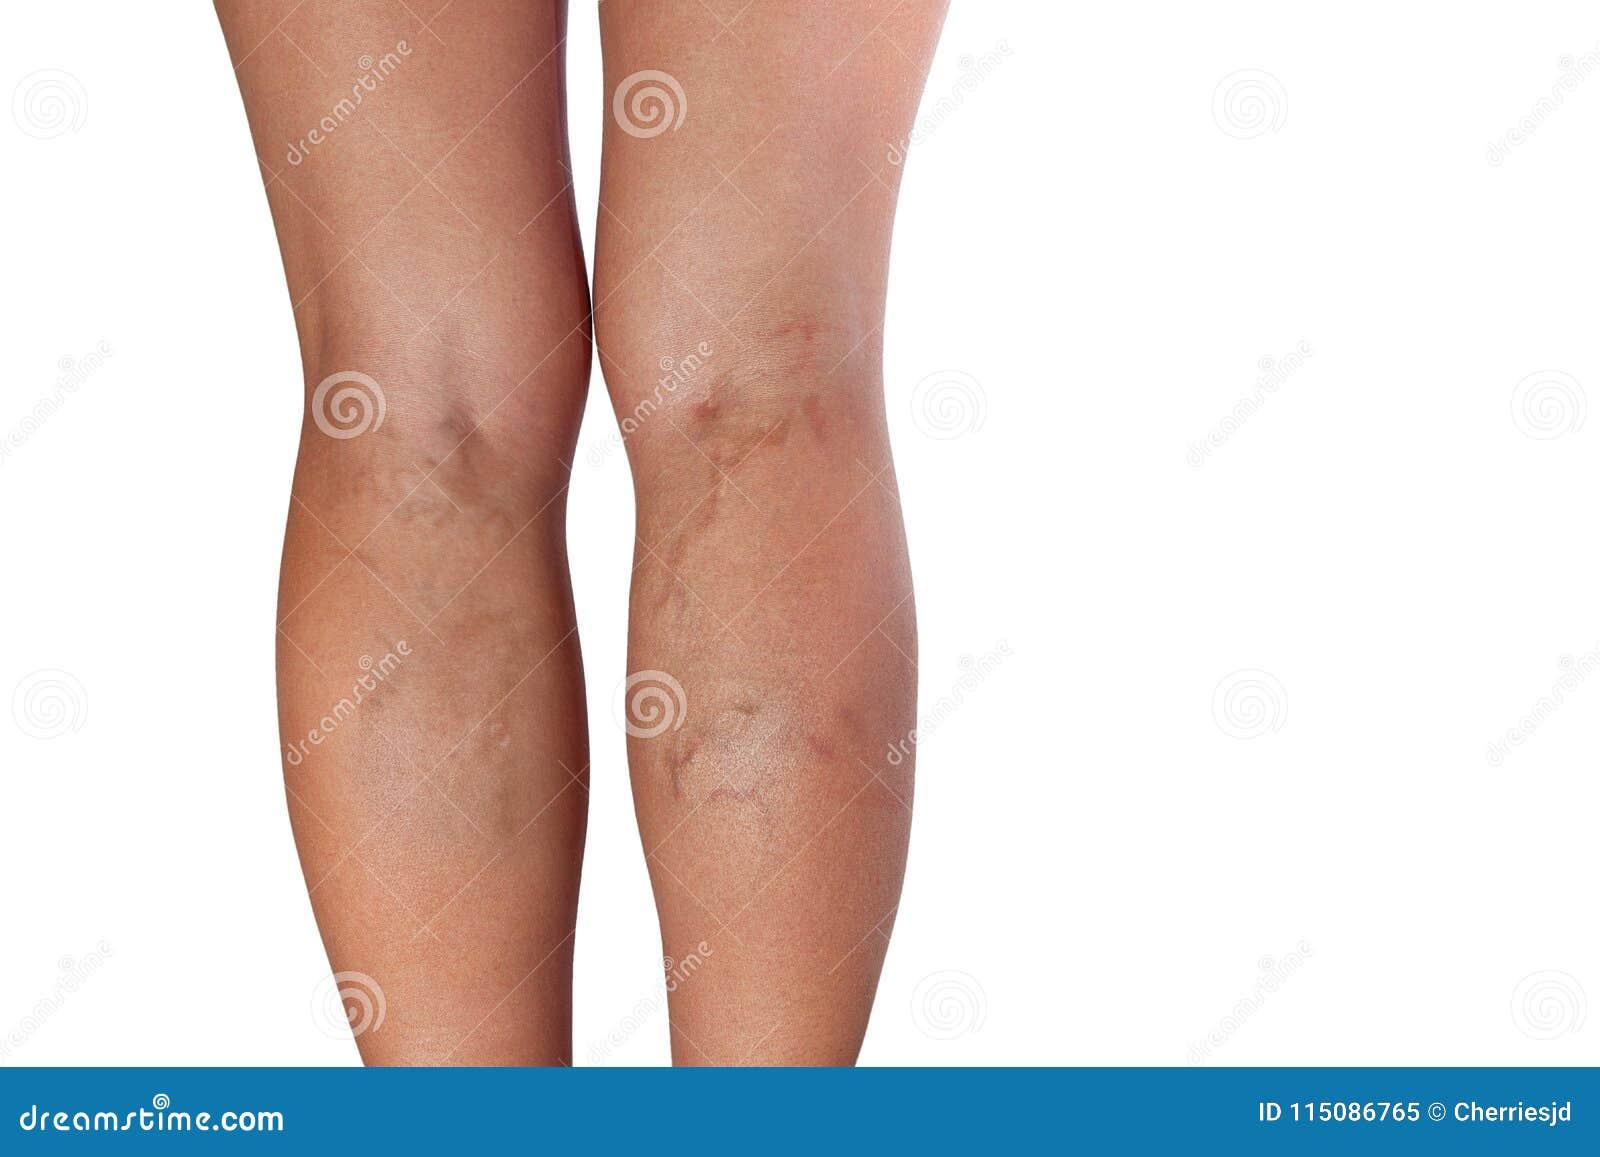 vene delle gambe doloranti